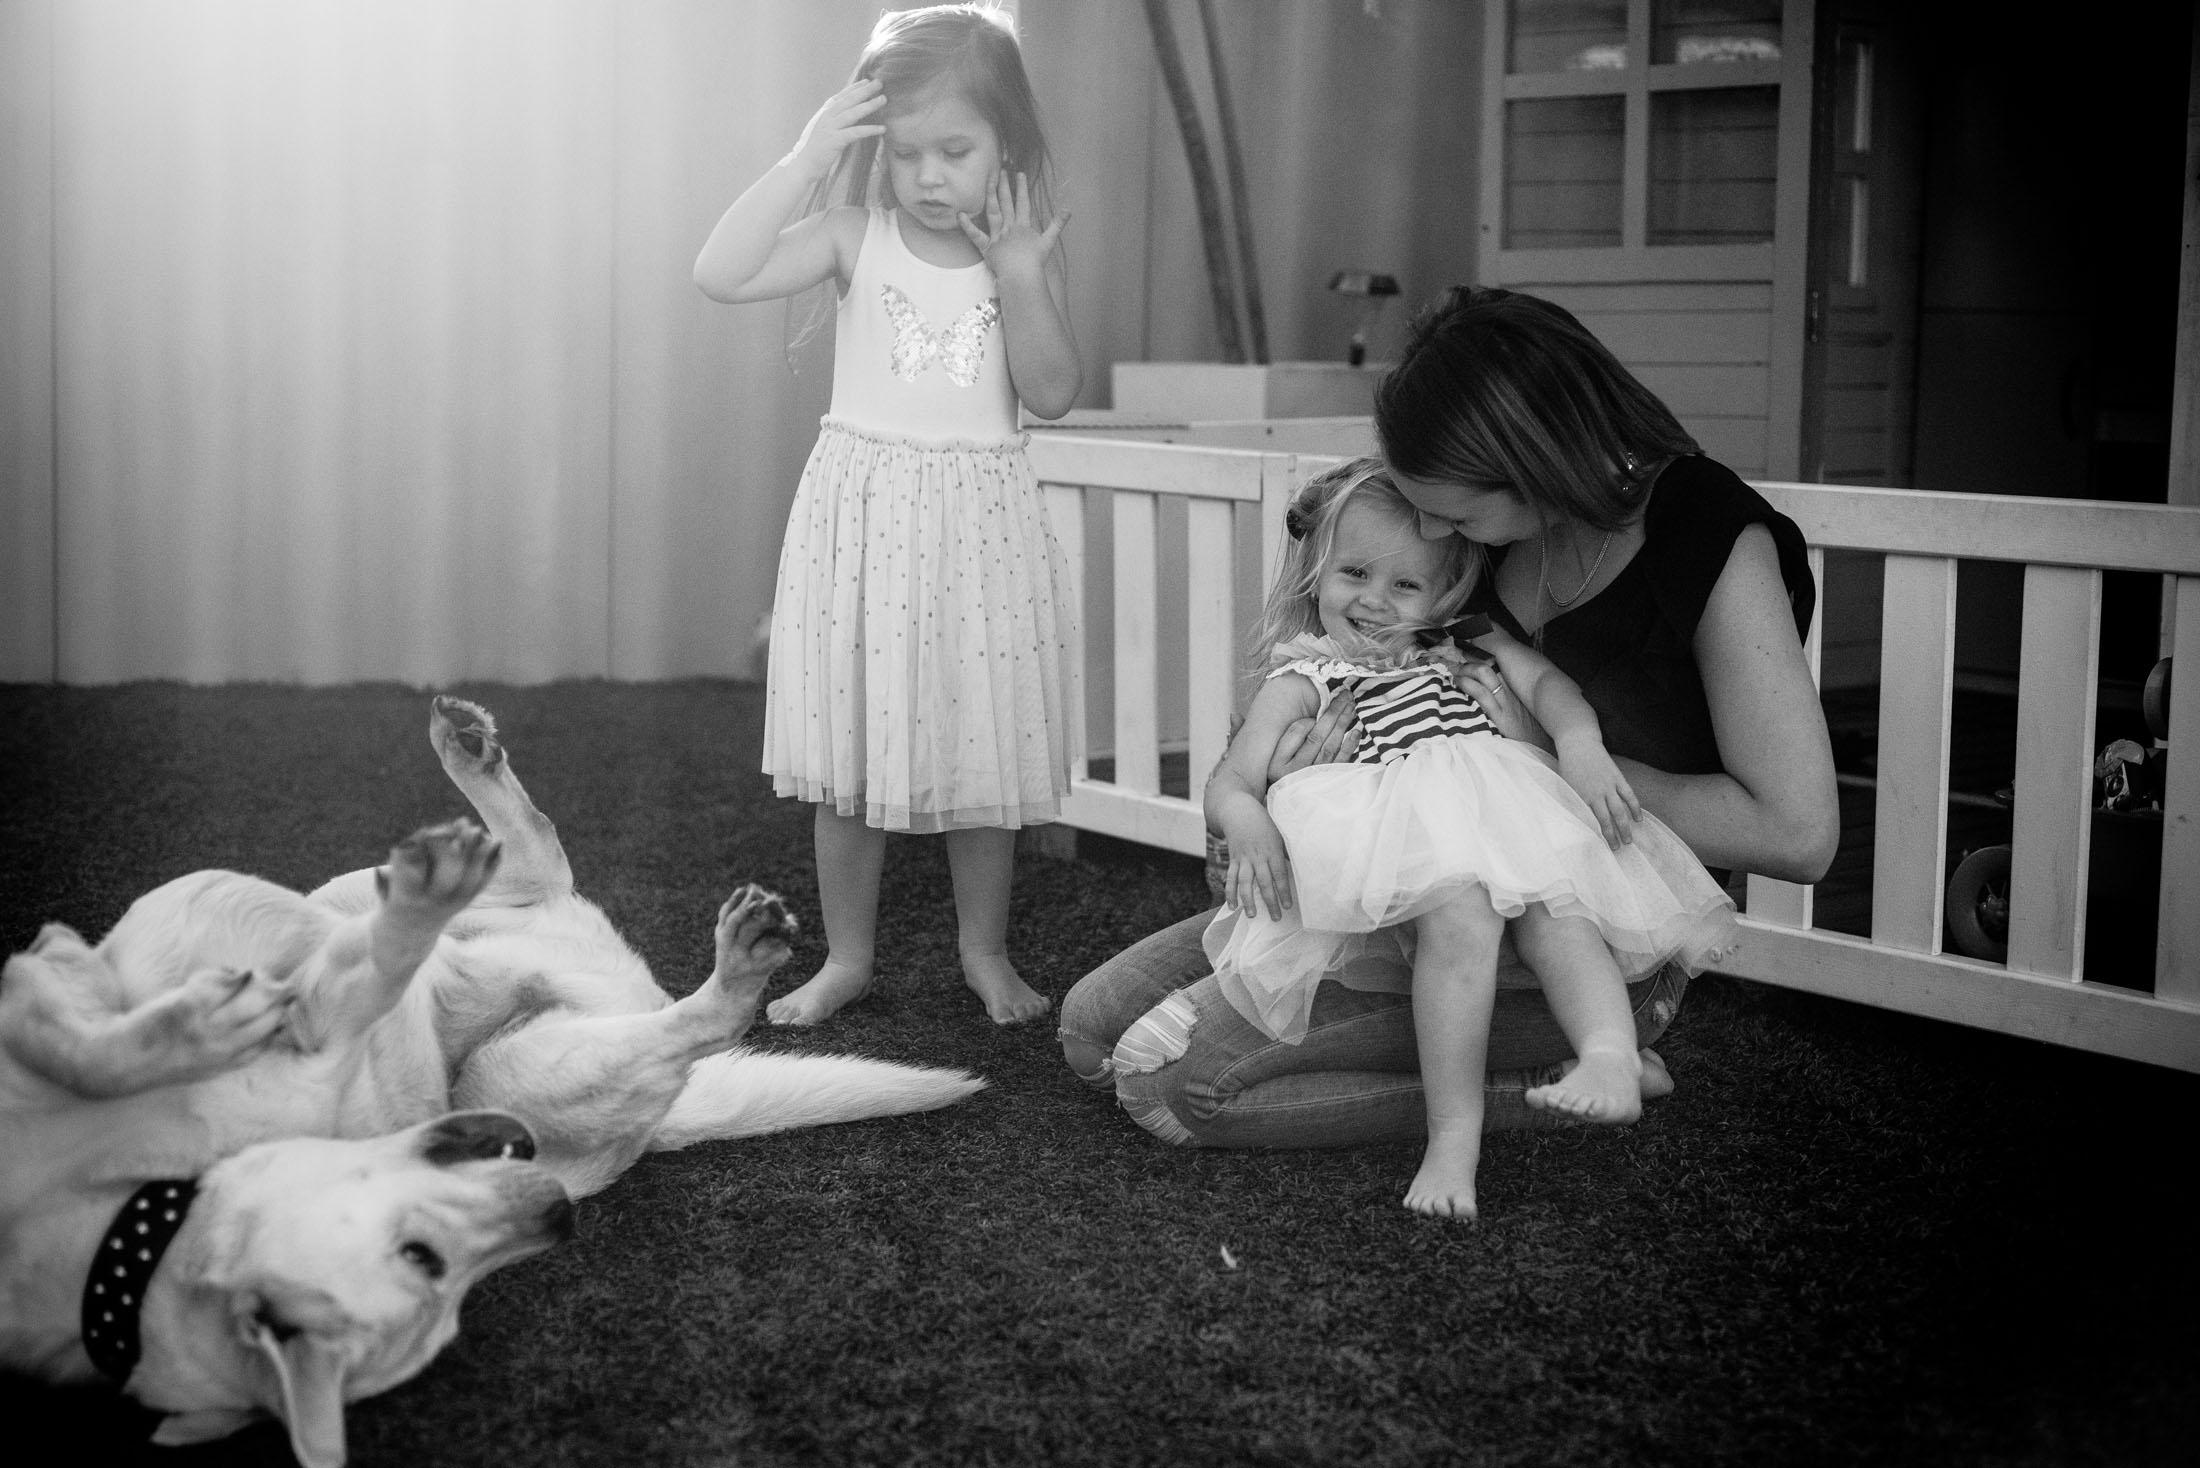 Sach_Family-Photography-unposed14.JPG